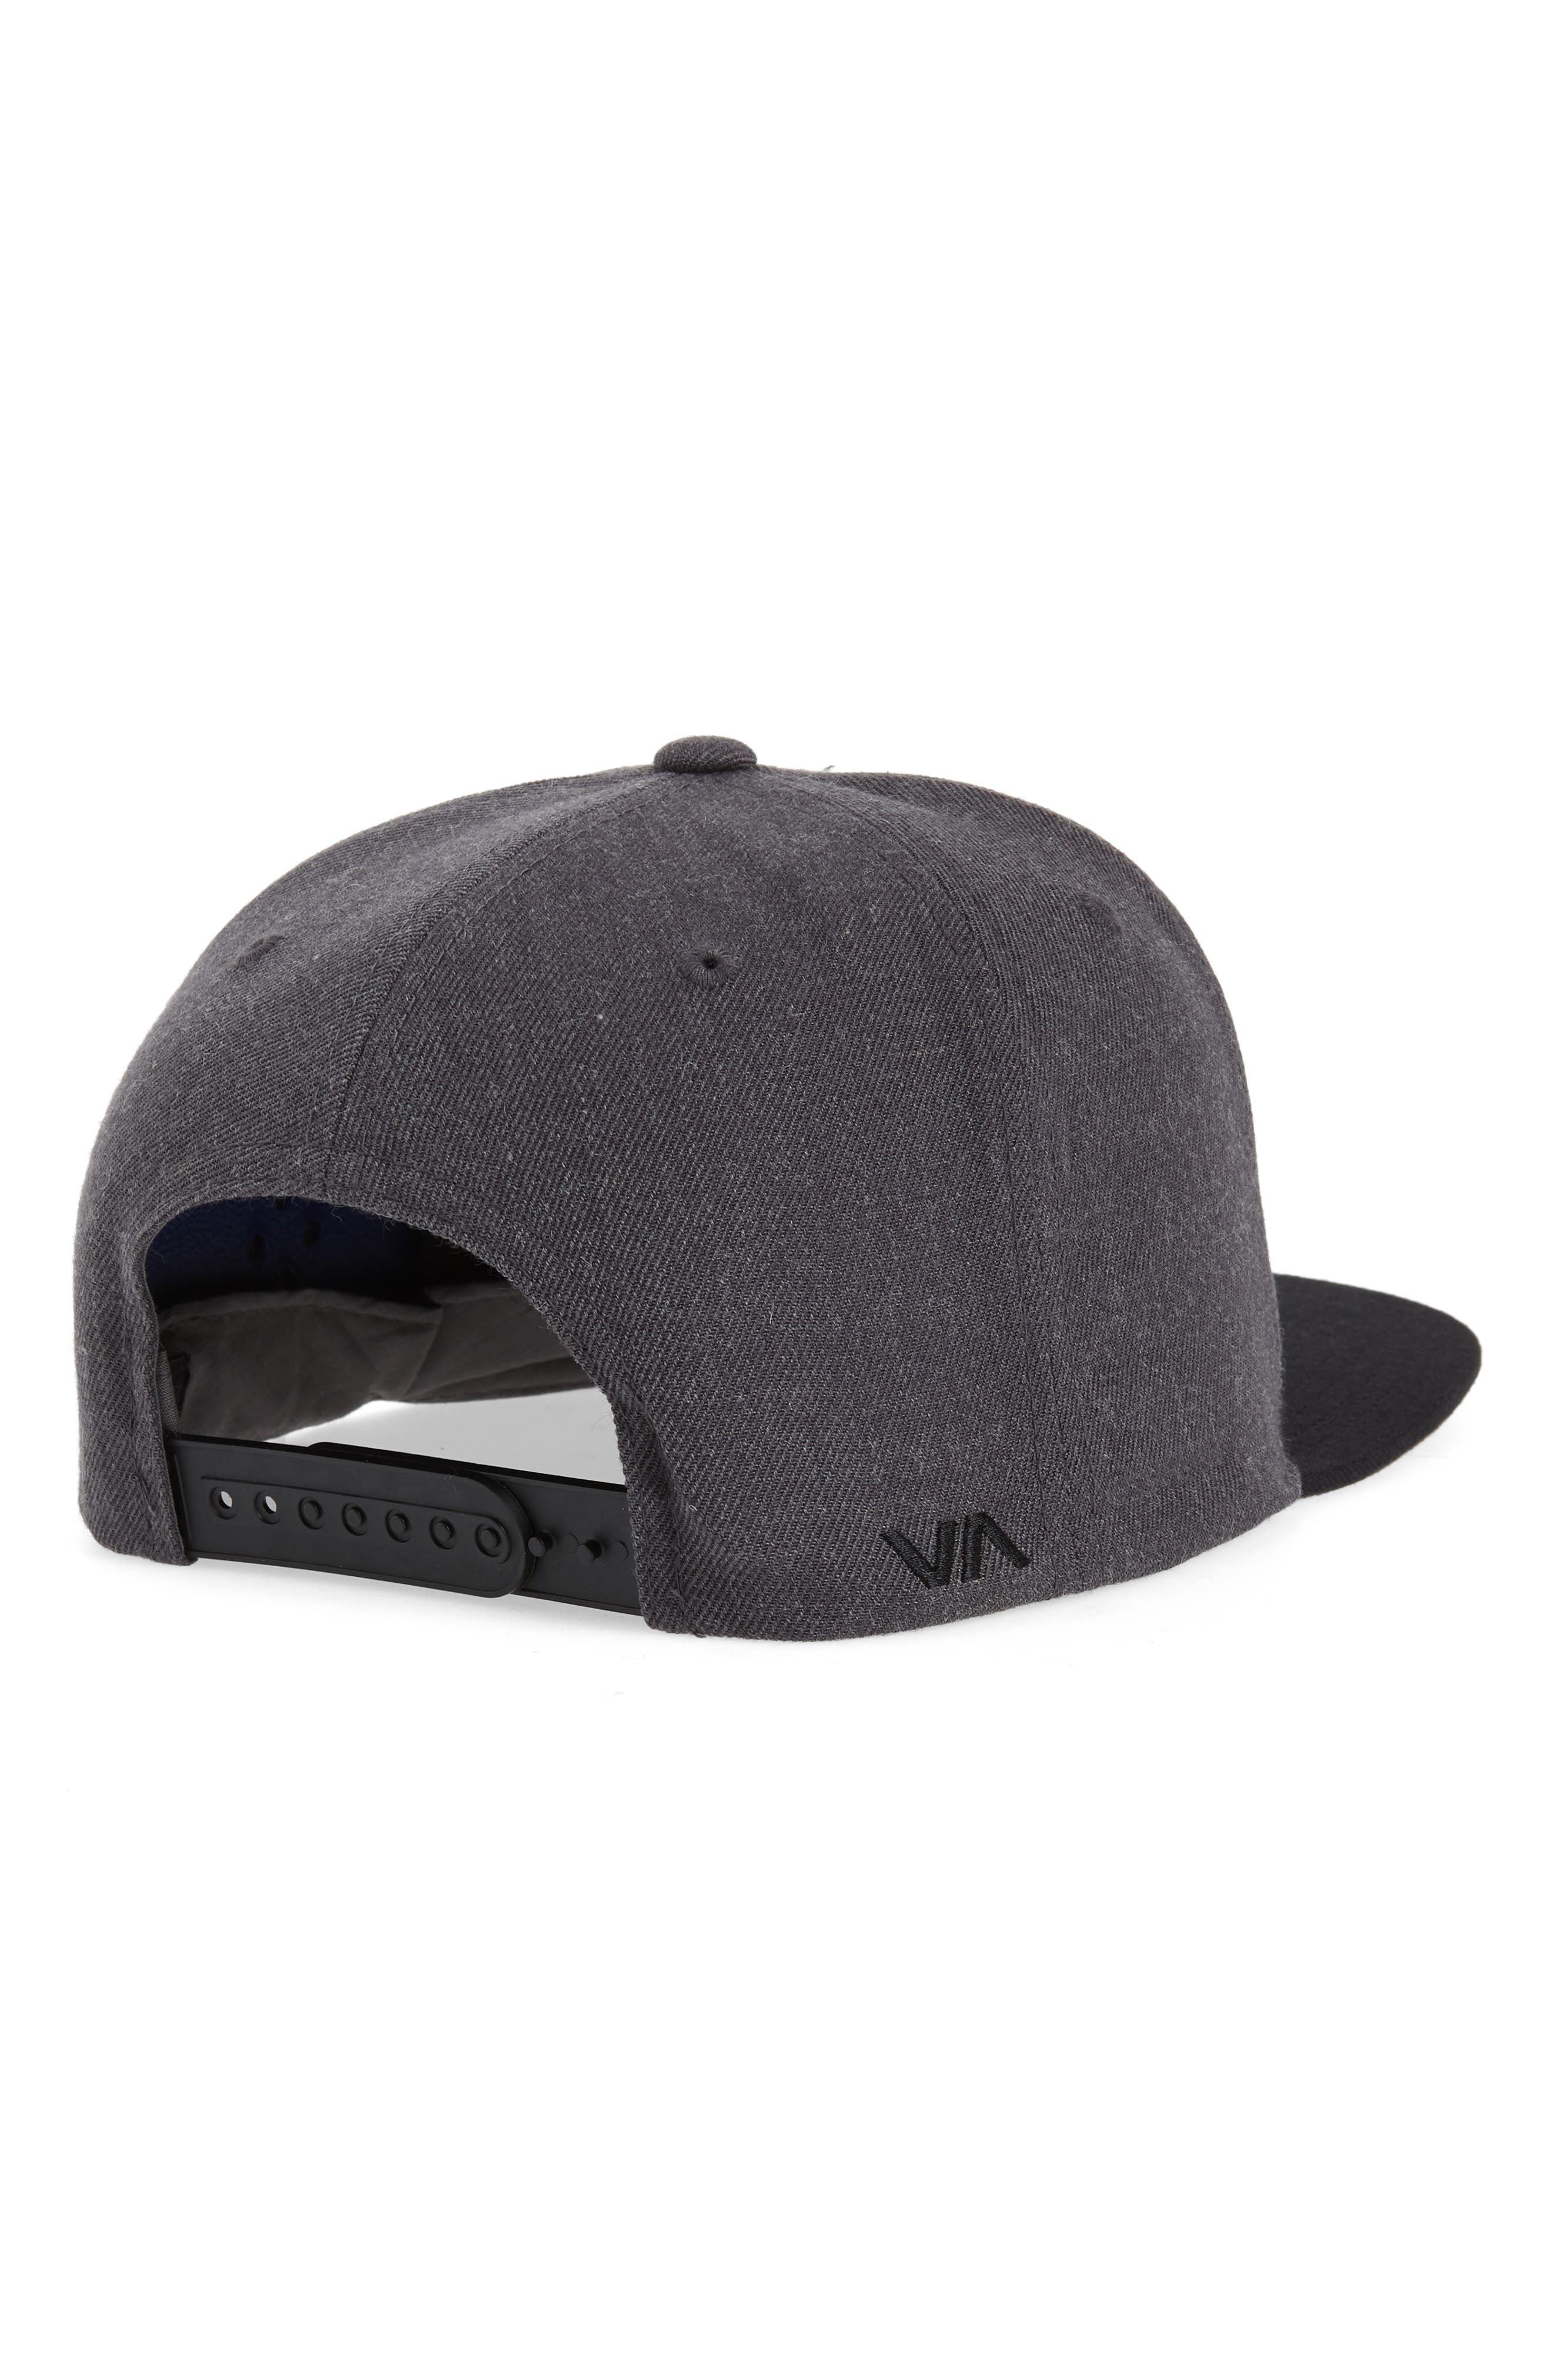 Twill Snapback Baseball Cap,                             Alternate thumbnail 2, color,                             CHARCOAL HEATHER/BLACK